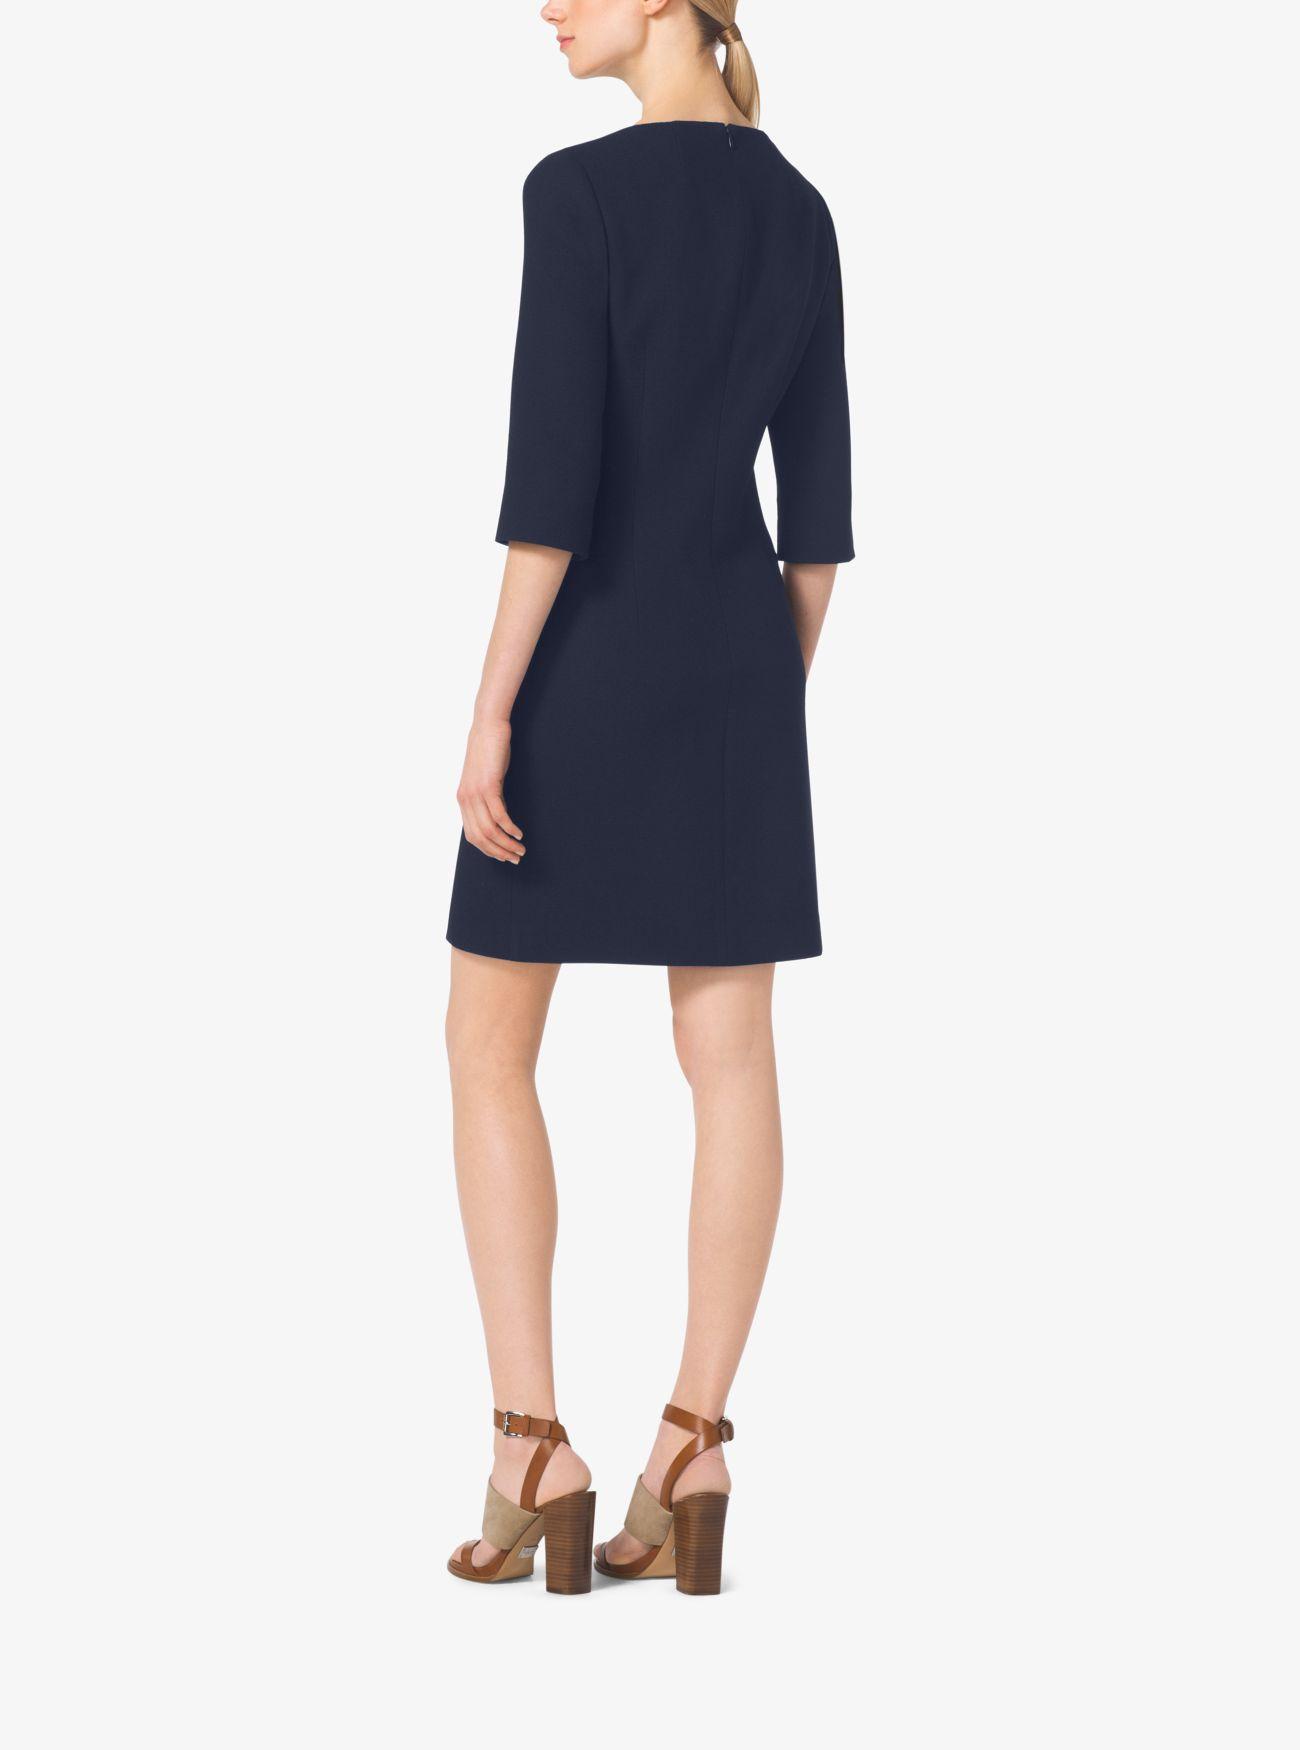 Эластичное платье-шифт из букле-крепа Michael Kors